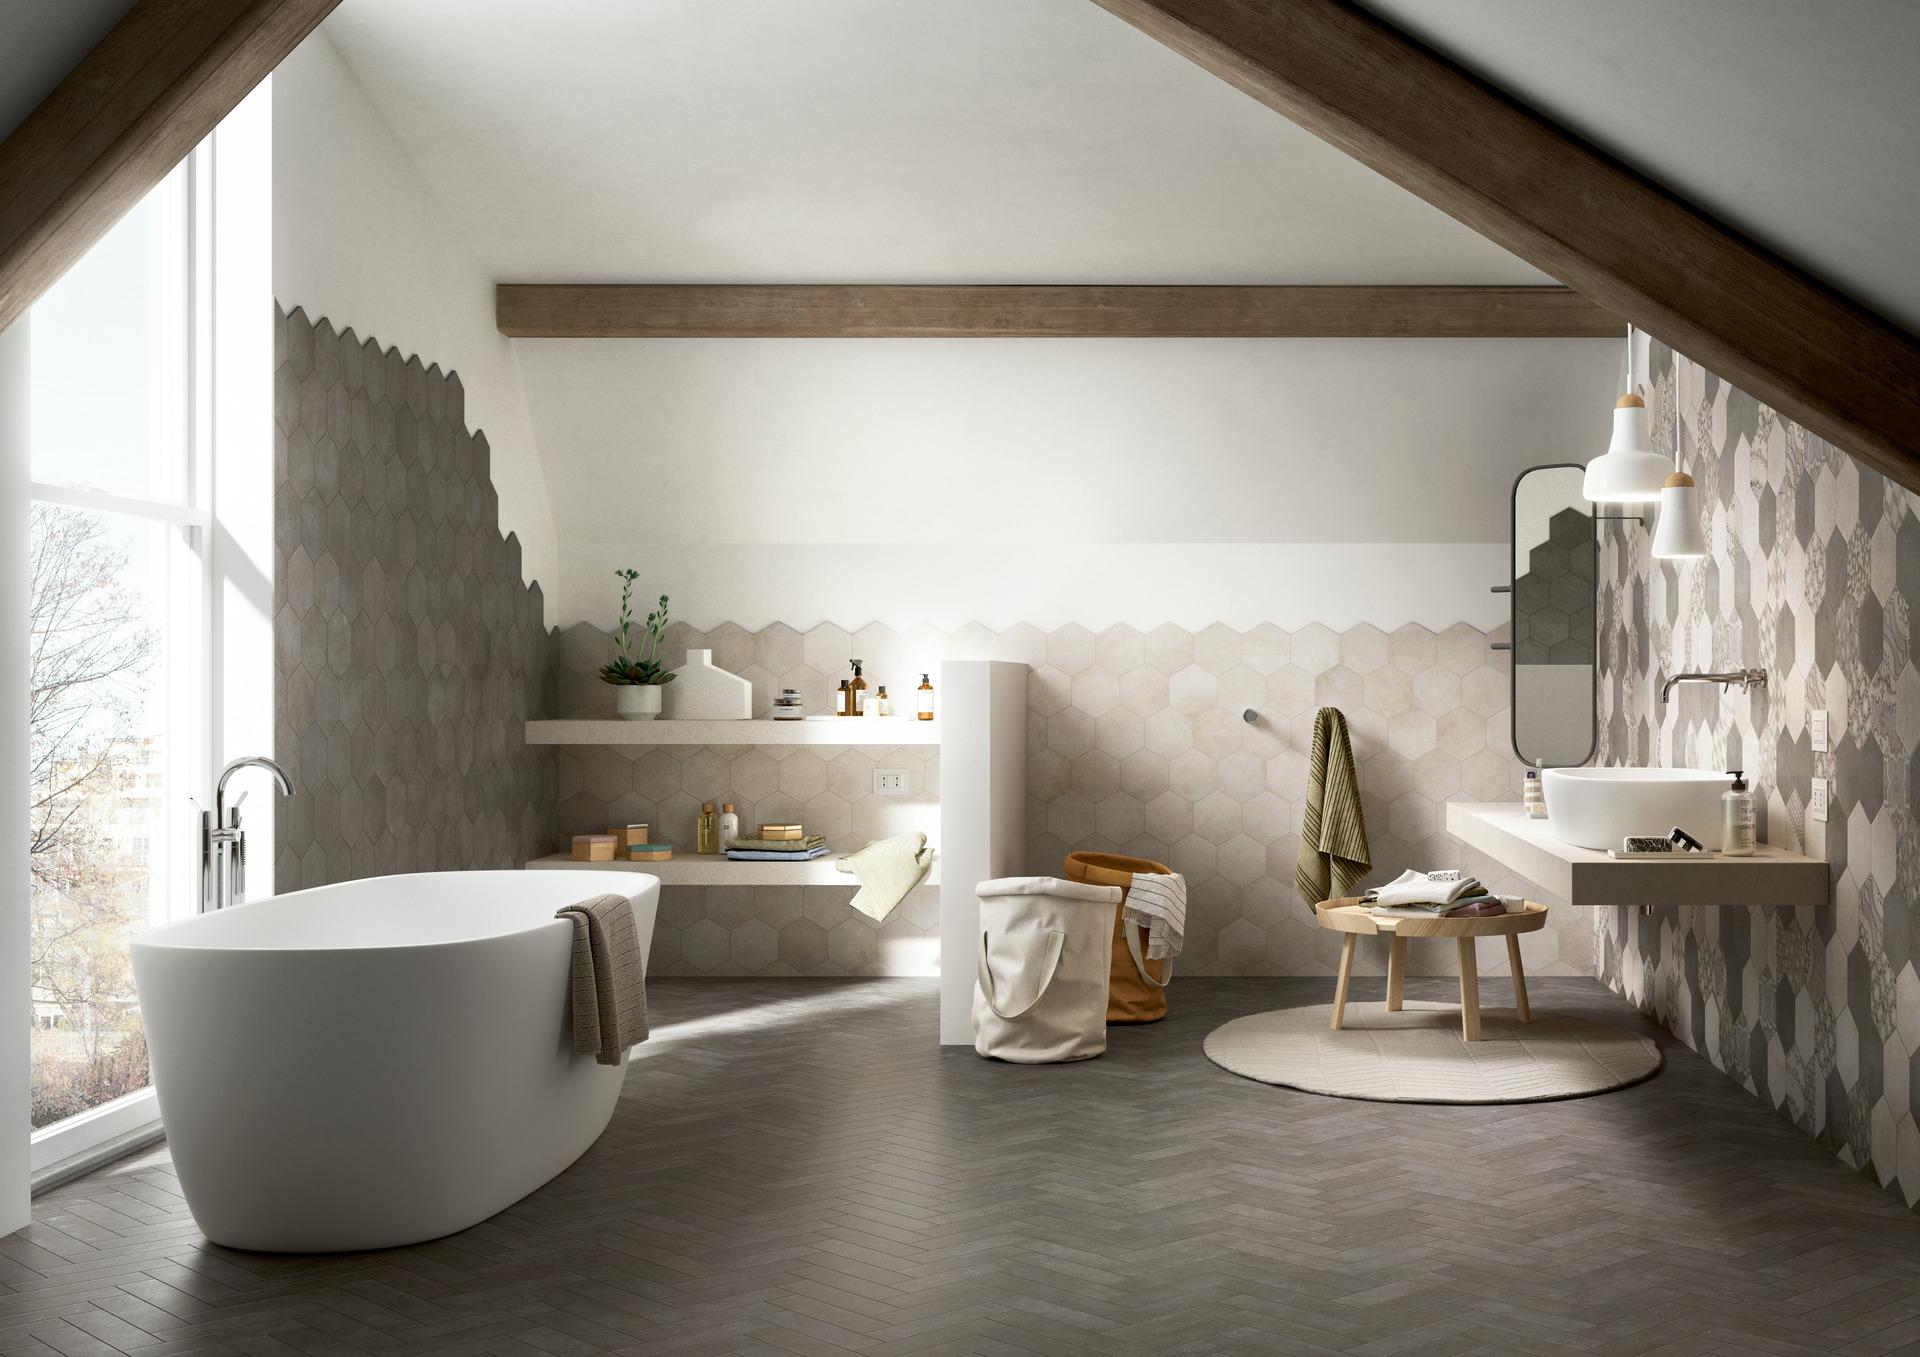 clays feinsteinzeug in cotto optik marazzi. Black Bedroom Furniture Sets. Home Design Ideas